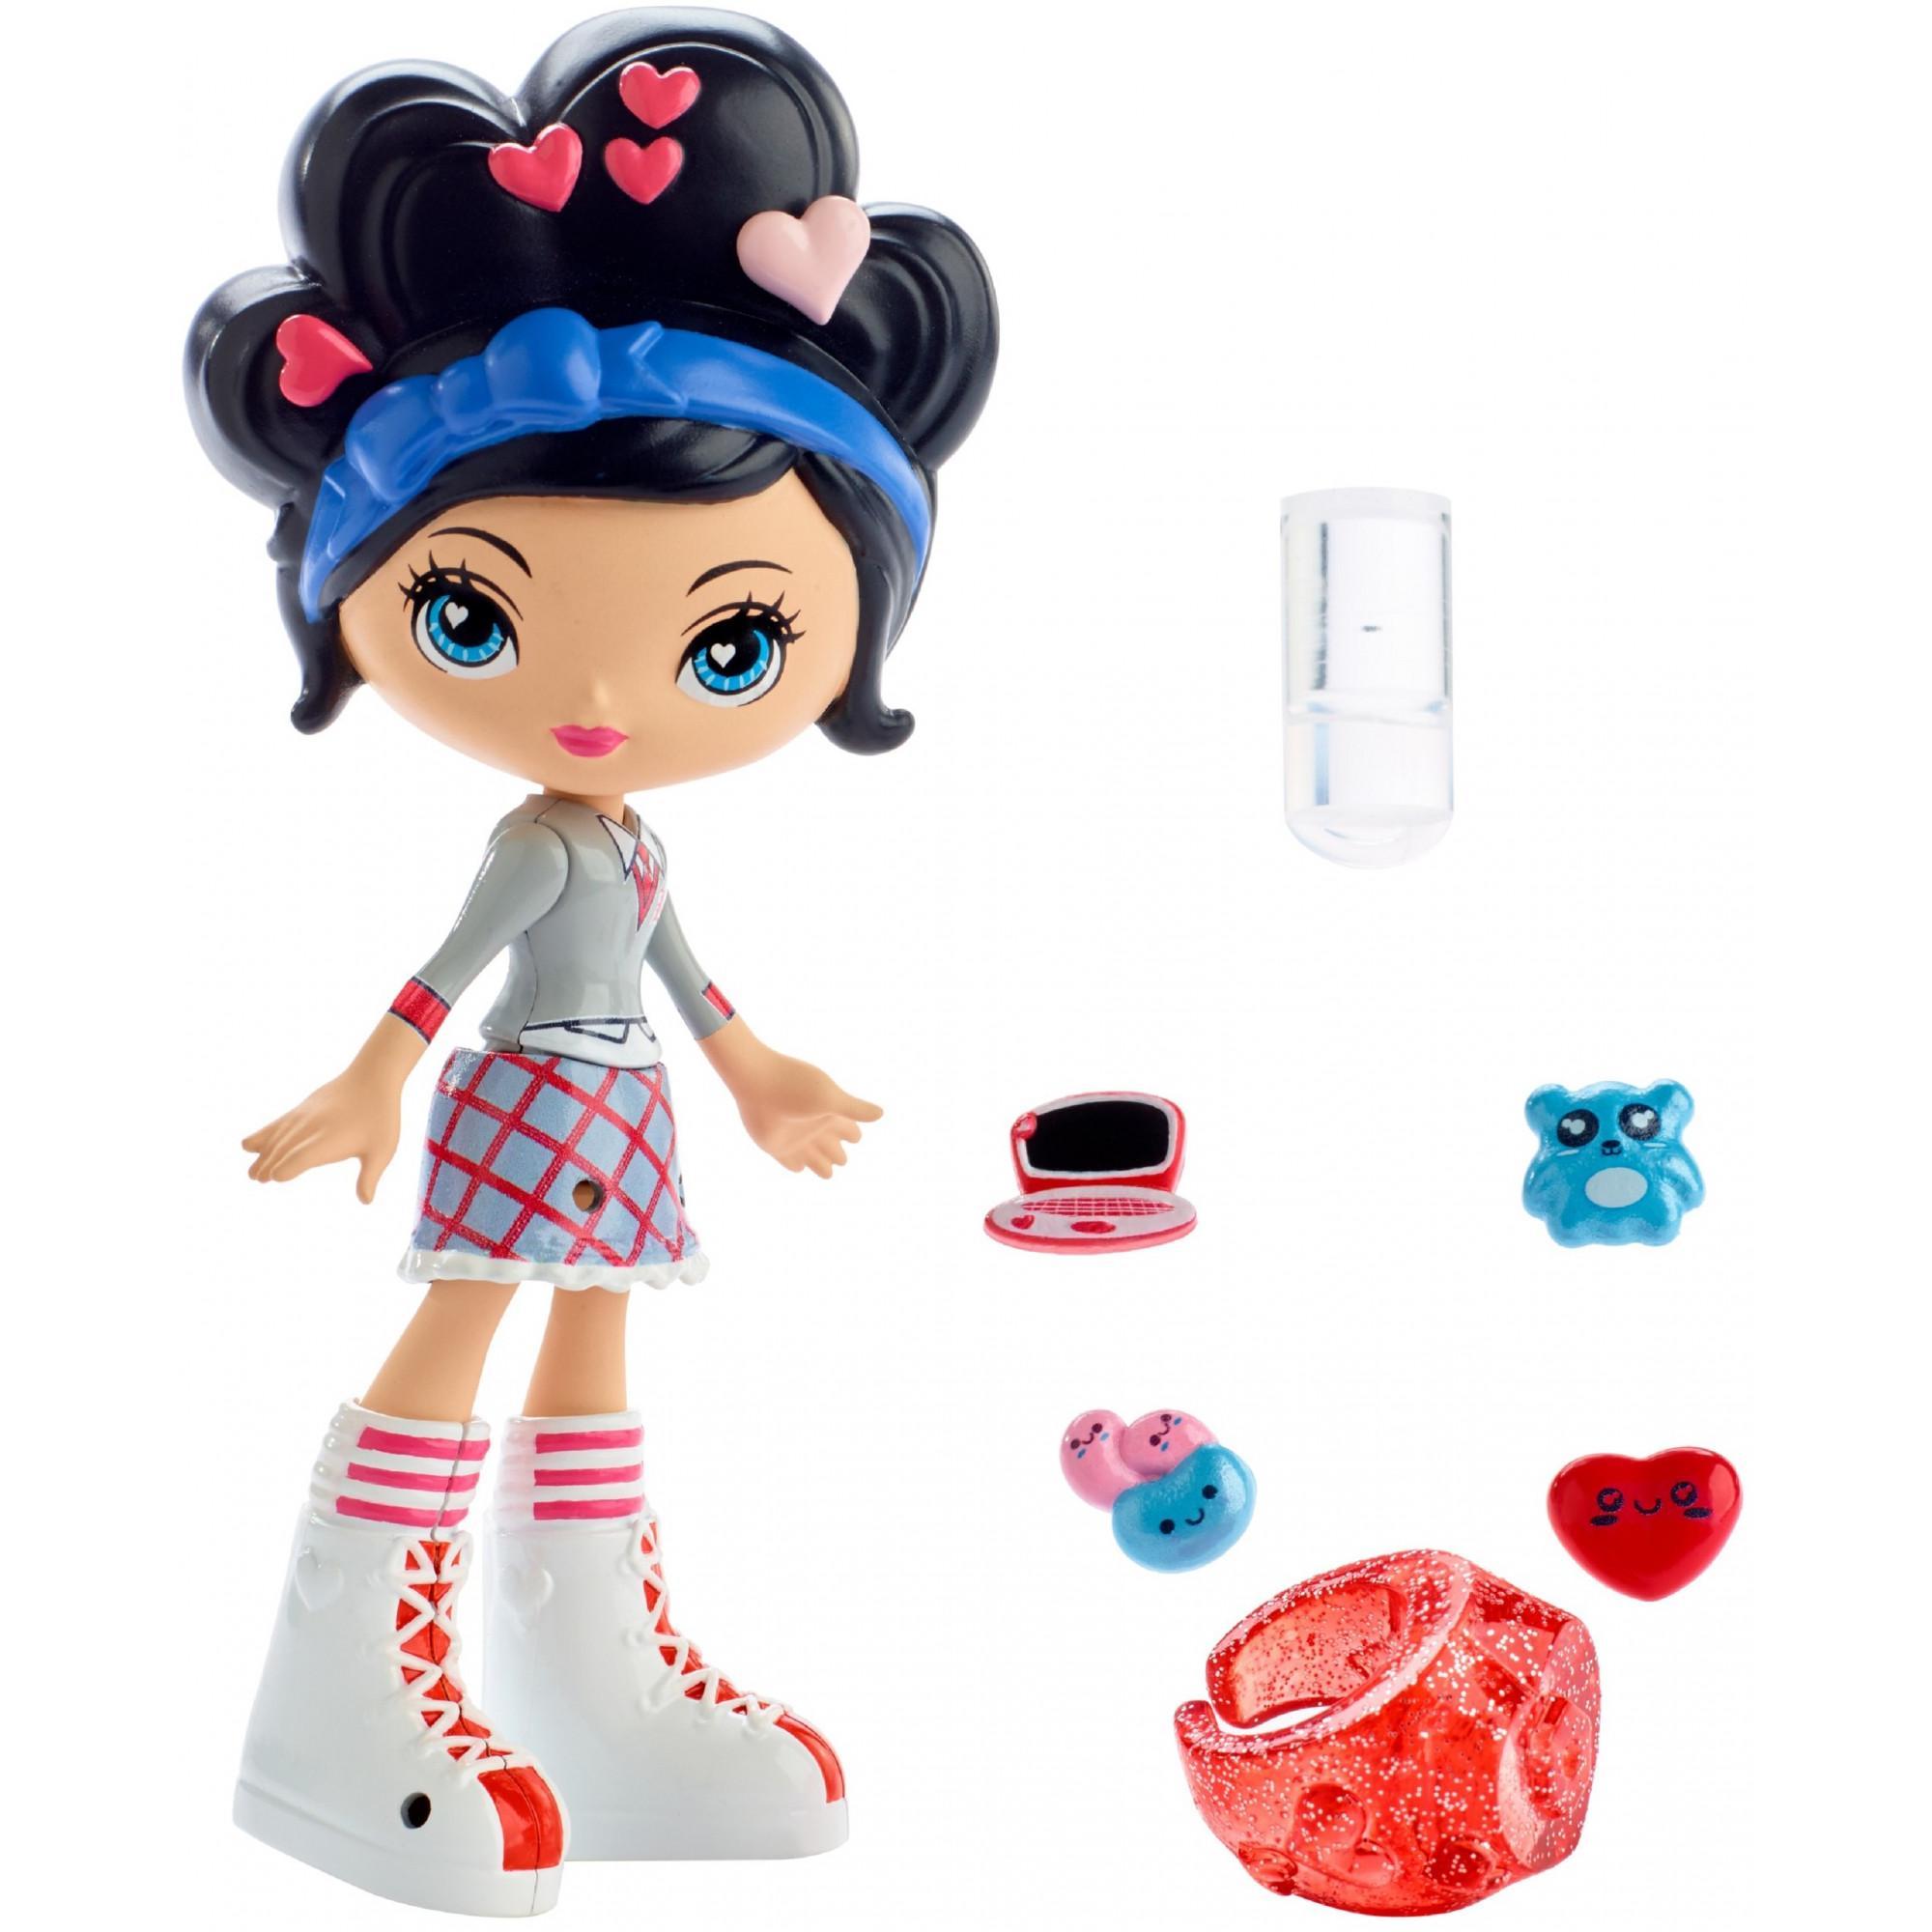 KuuKuu Harajuku Love Doll